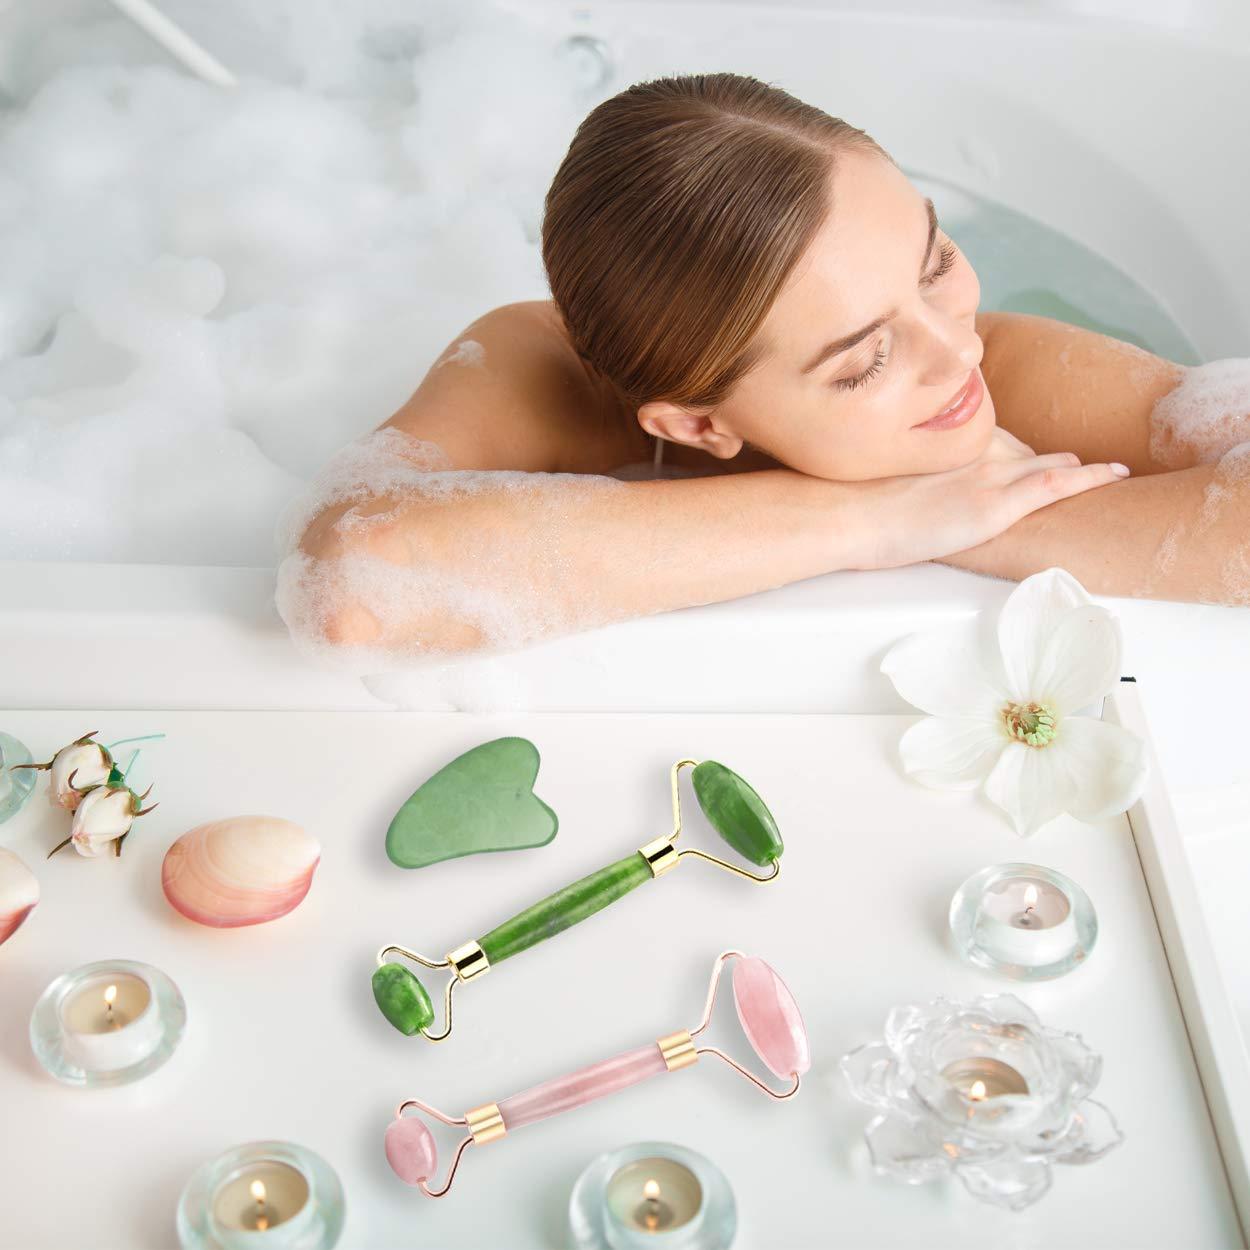 Jade Roller for Face & Natural Rose Quartz Roller & Gua Sha Scraping Tool, 3 in 1 Anti-Aging Jade Face Roller Massager for Cheeks Slimmer, Skin Tightening, Rejuvenate Skin